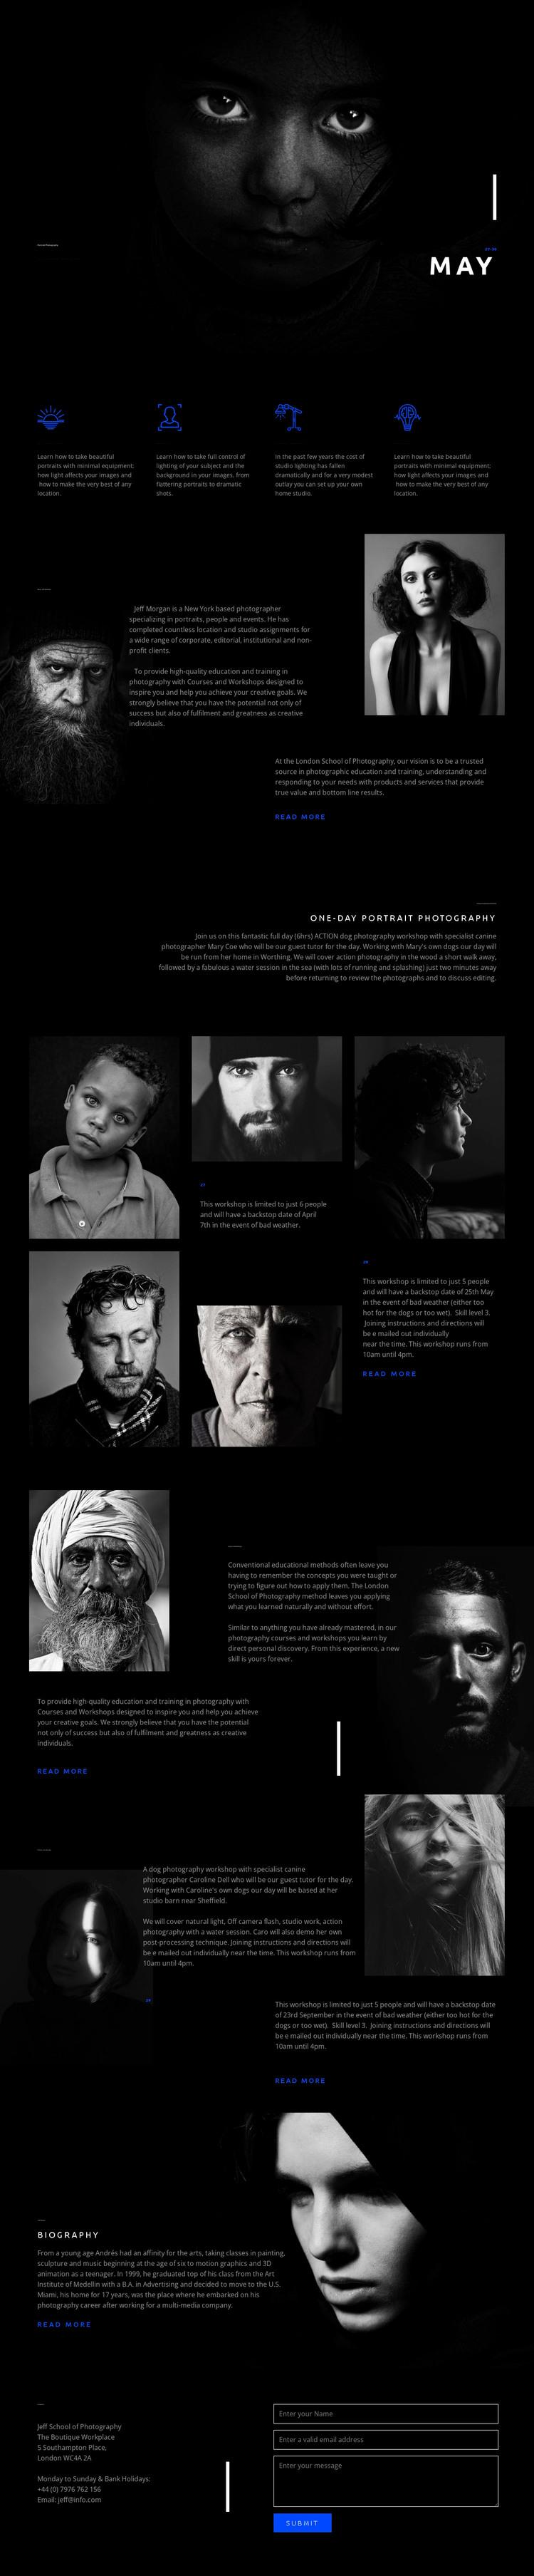 Amazing portrait art Web Design